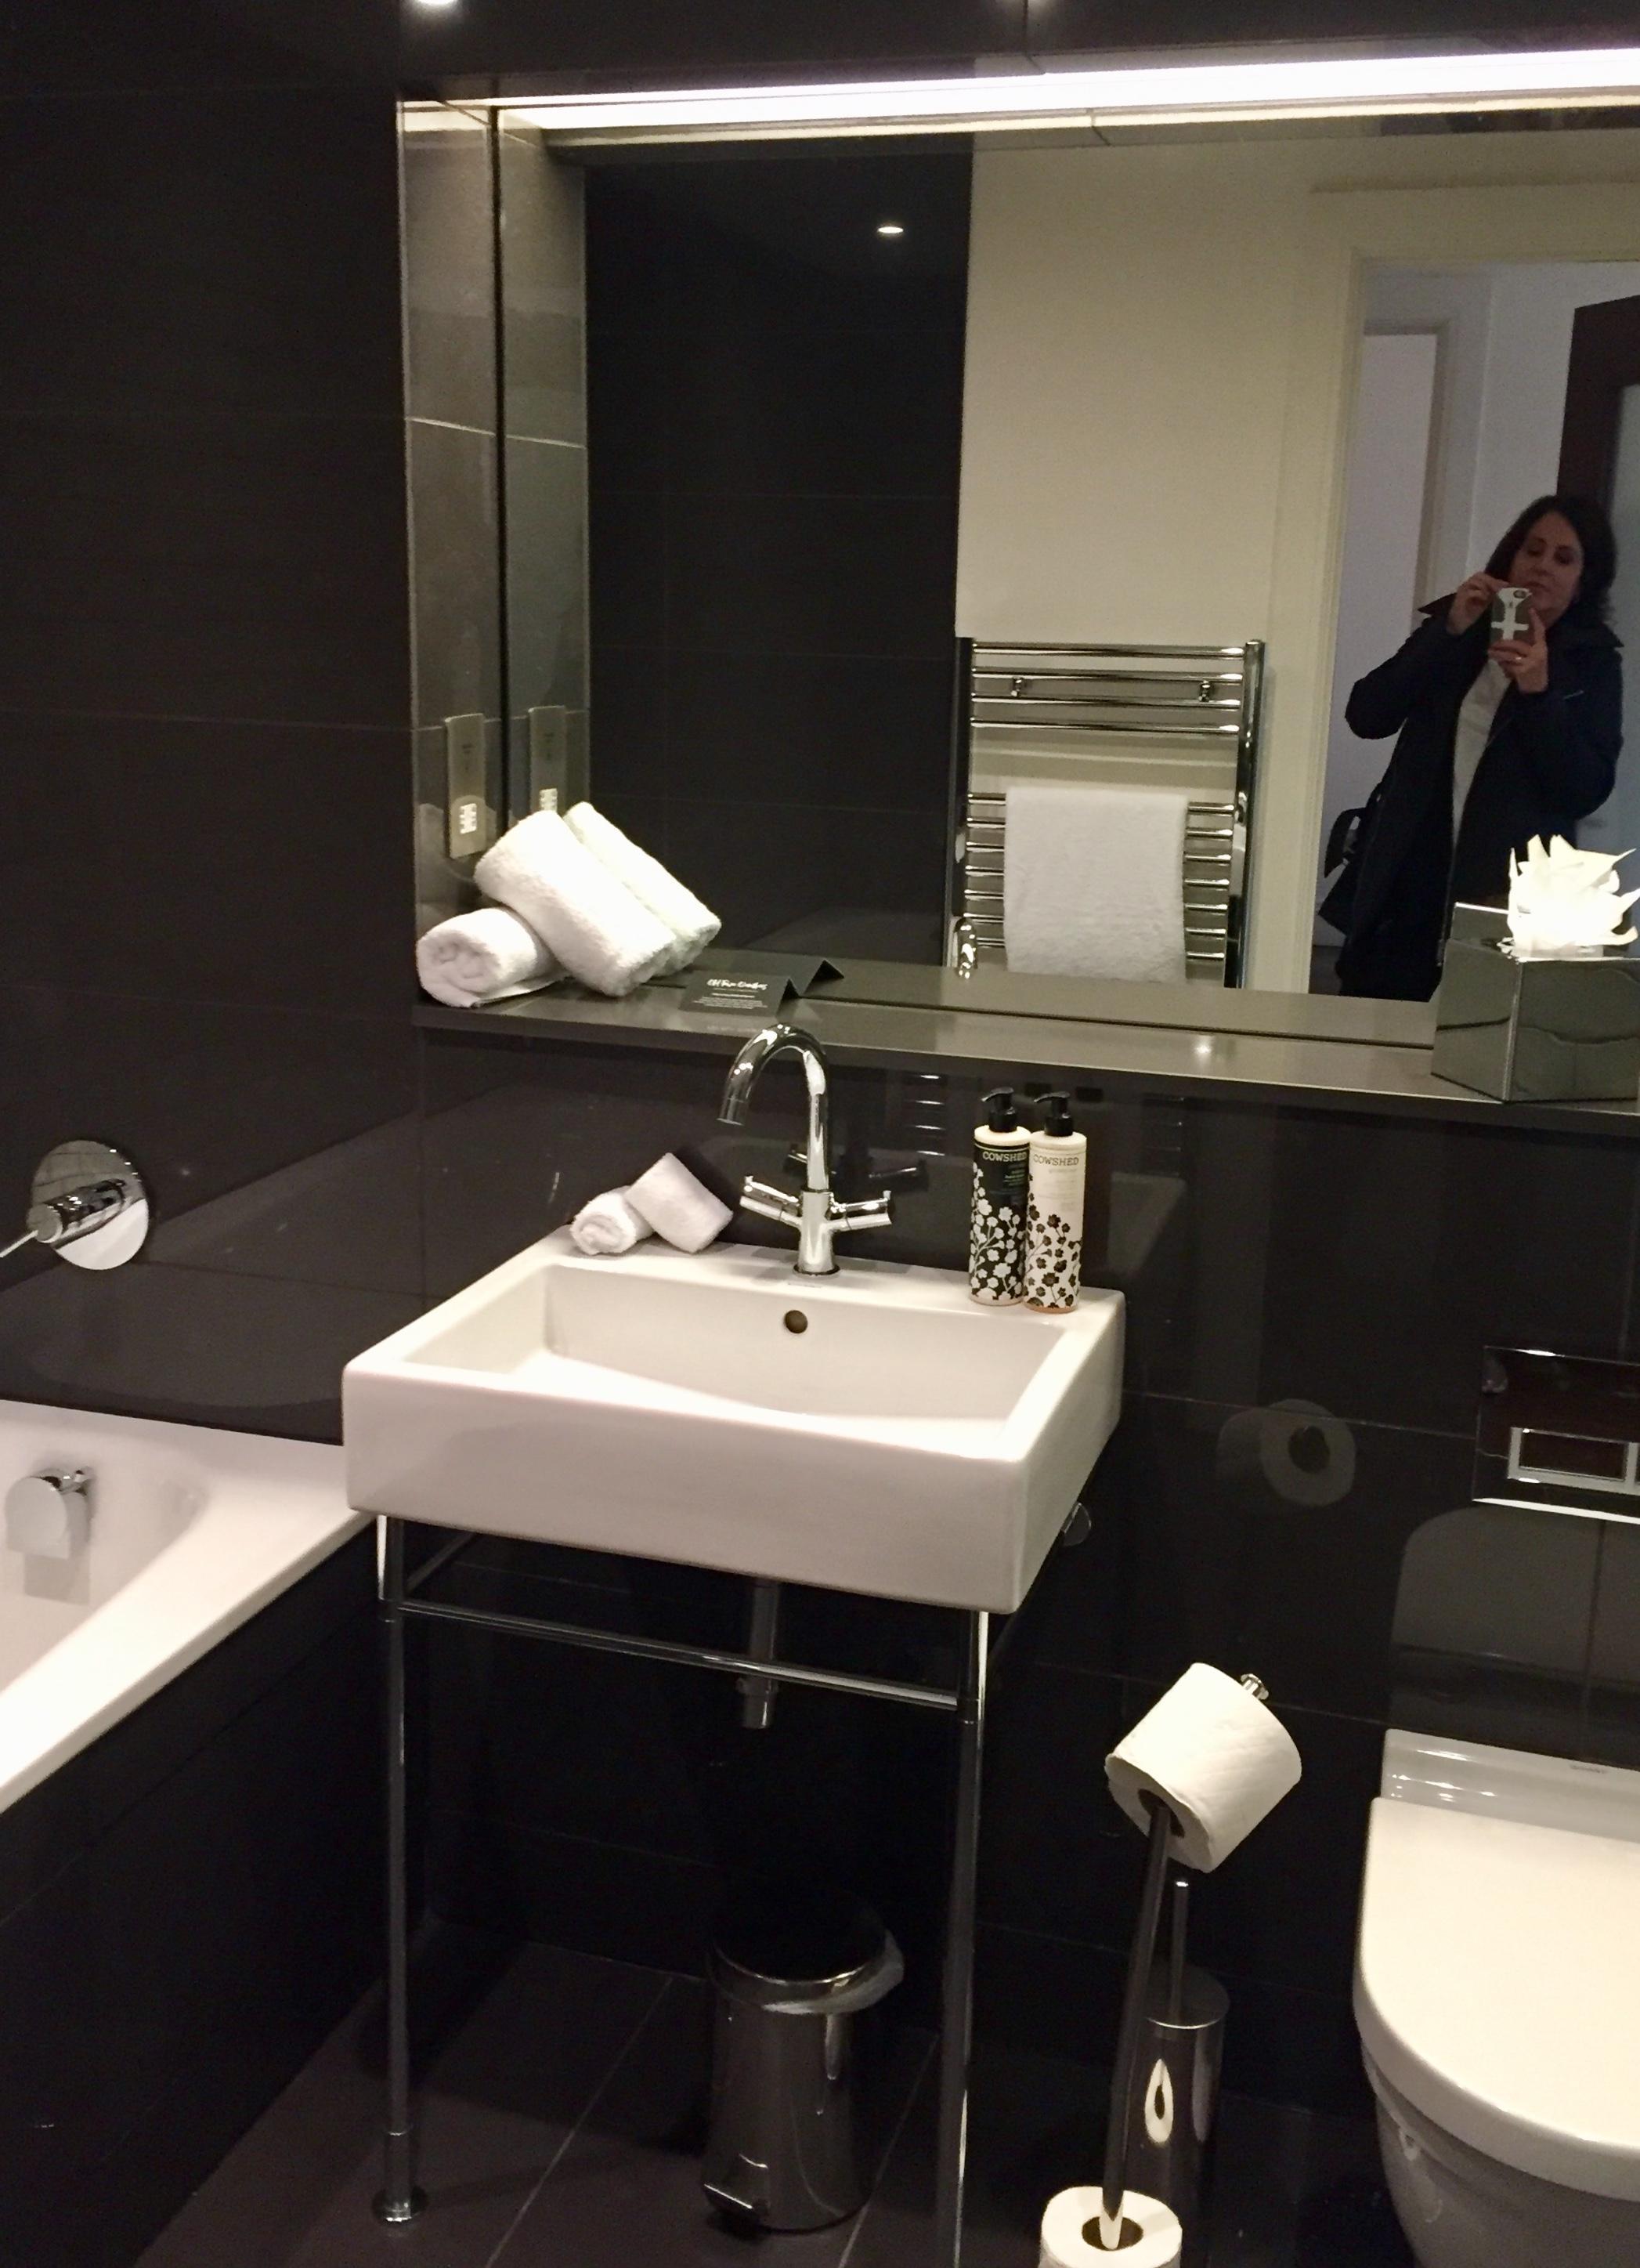 Bathrooms were so lovely.